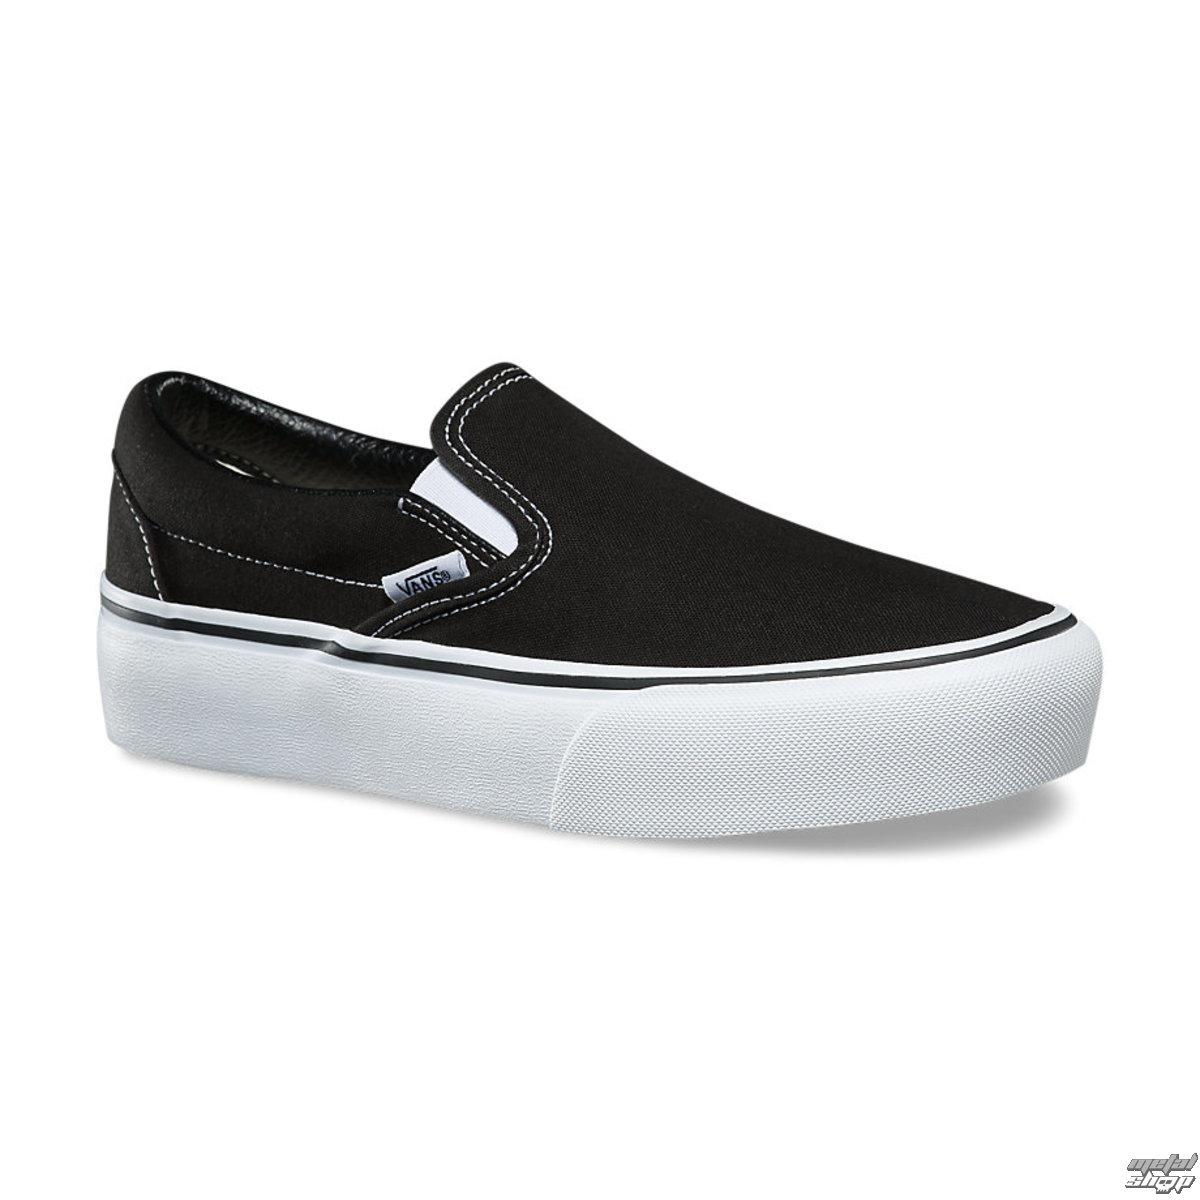 0908a8a54d398b Women s shoes VANS - UA CLASSIC SLIP-ON PLATFORM Black - V0018EBLK -  metal-shop.eu